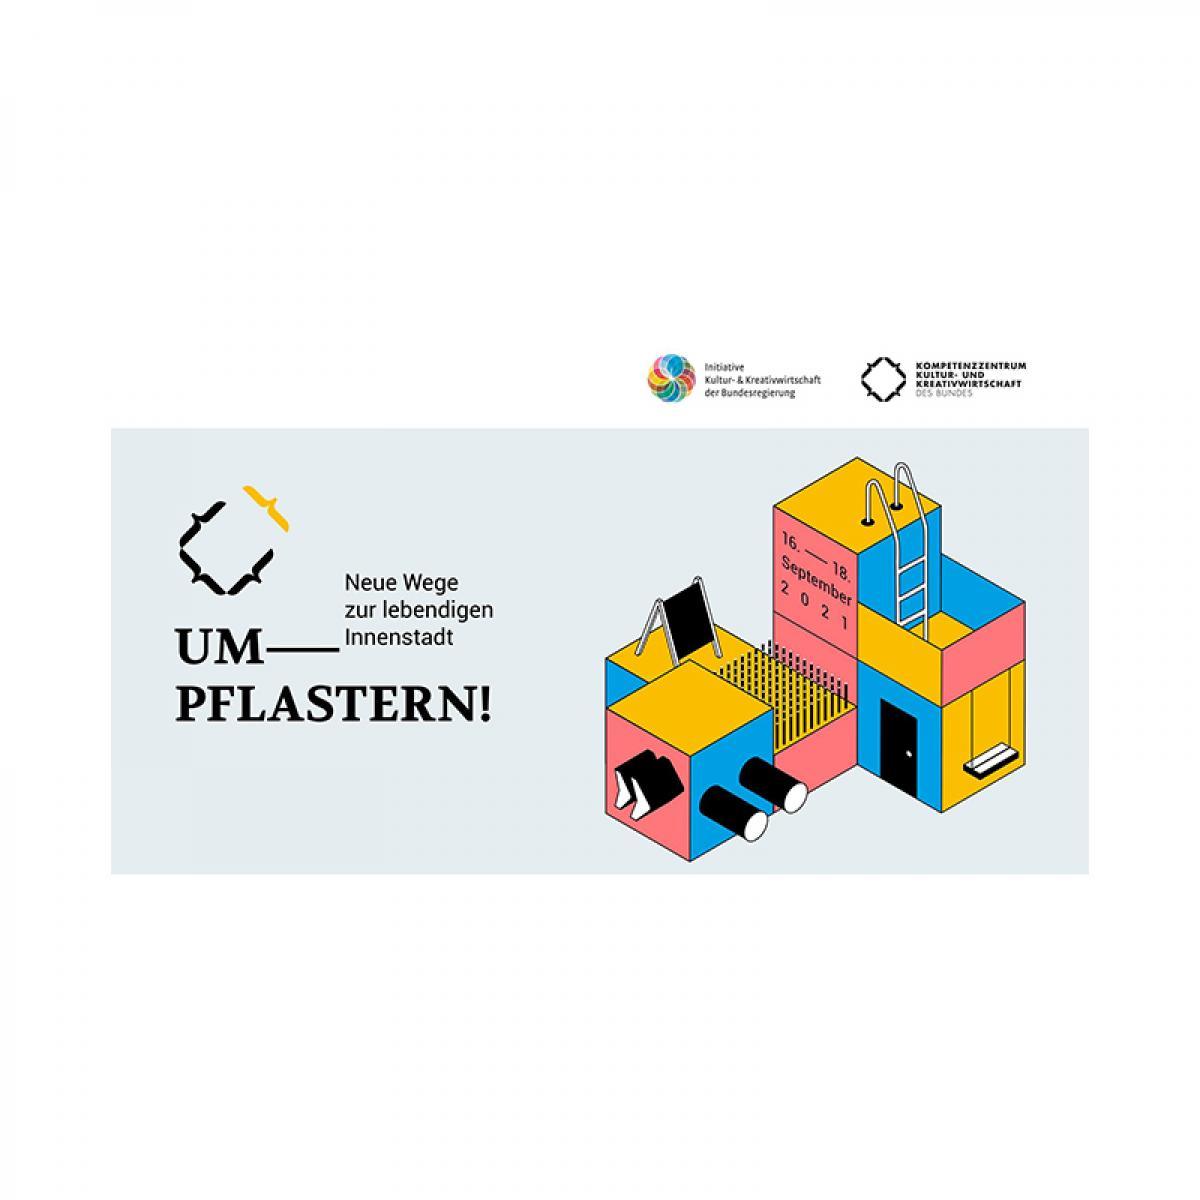 Colonia Nova - Kreativ Bund - UM-PFLASTERN!